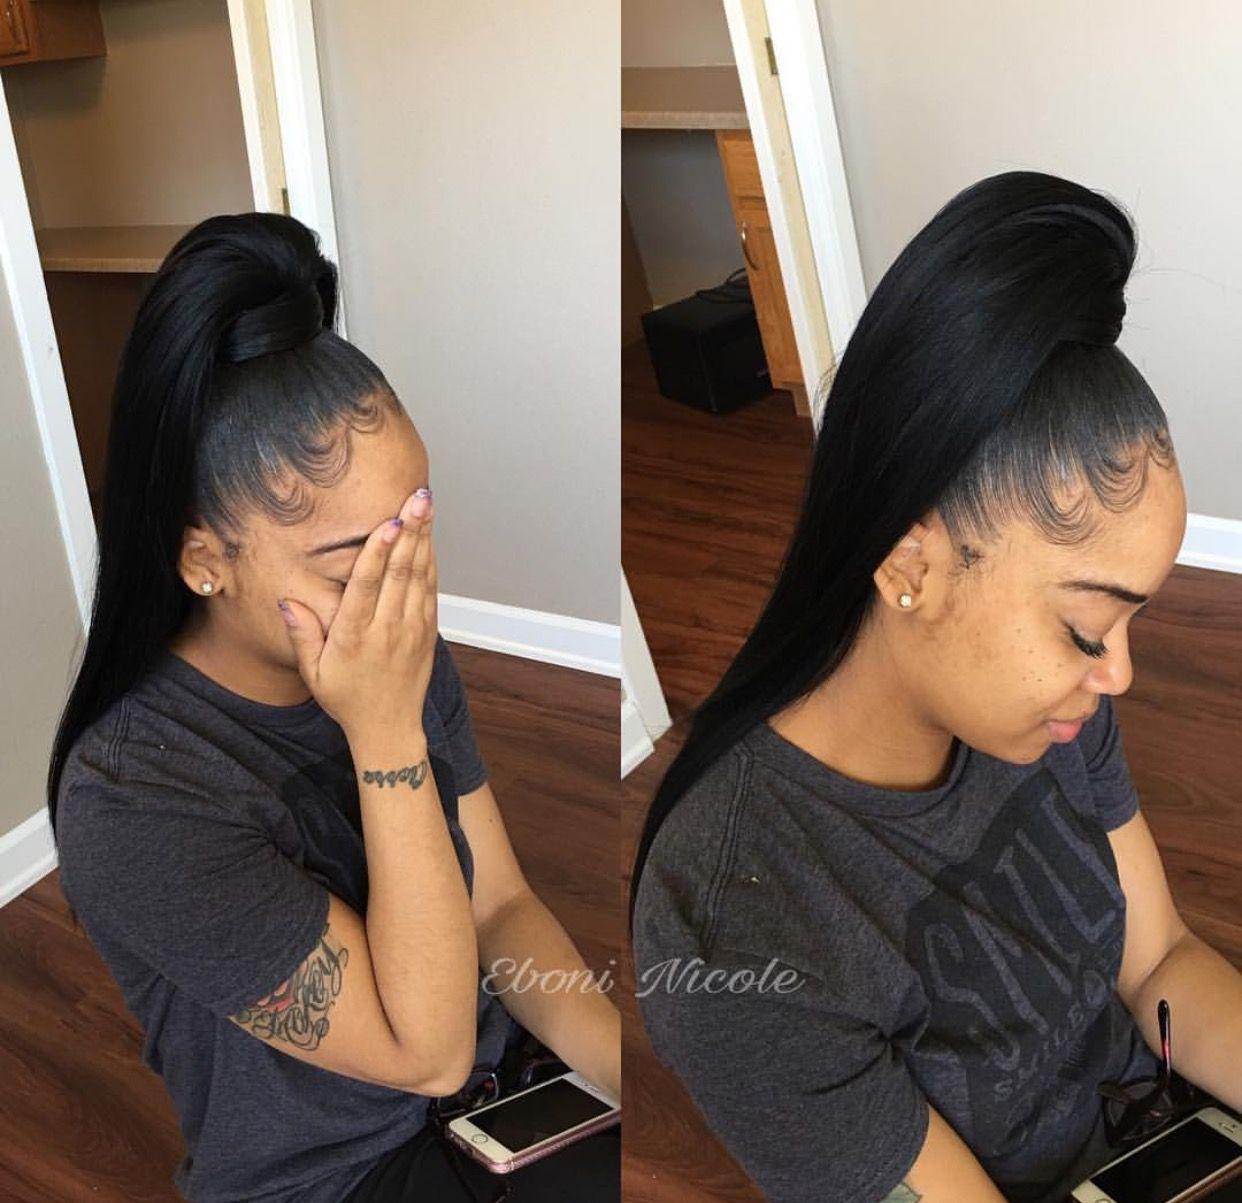 Pin By Kyra On Slayed Hair Long Ponytail Hairstyles Ponytail Styles High Ponytail Hairstyles